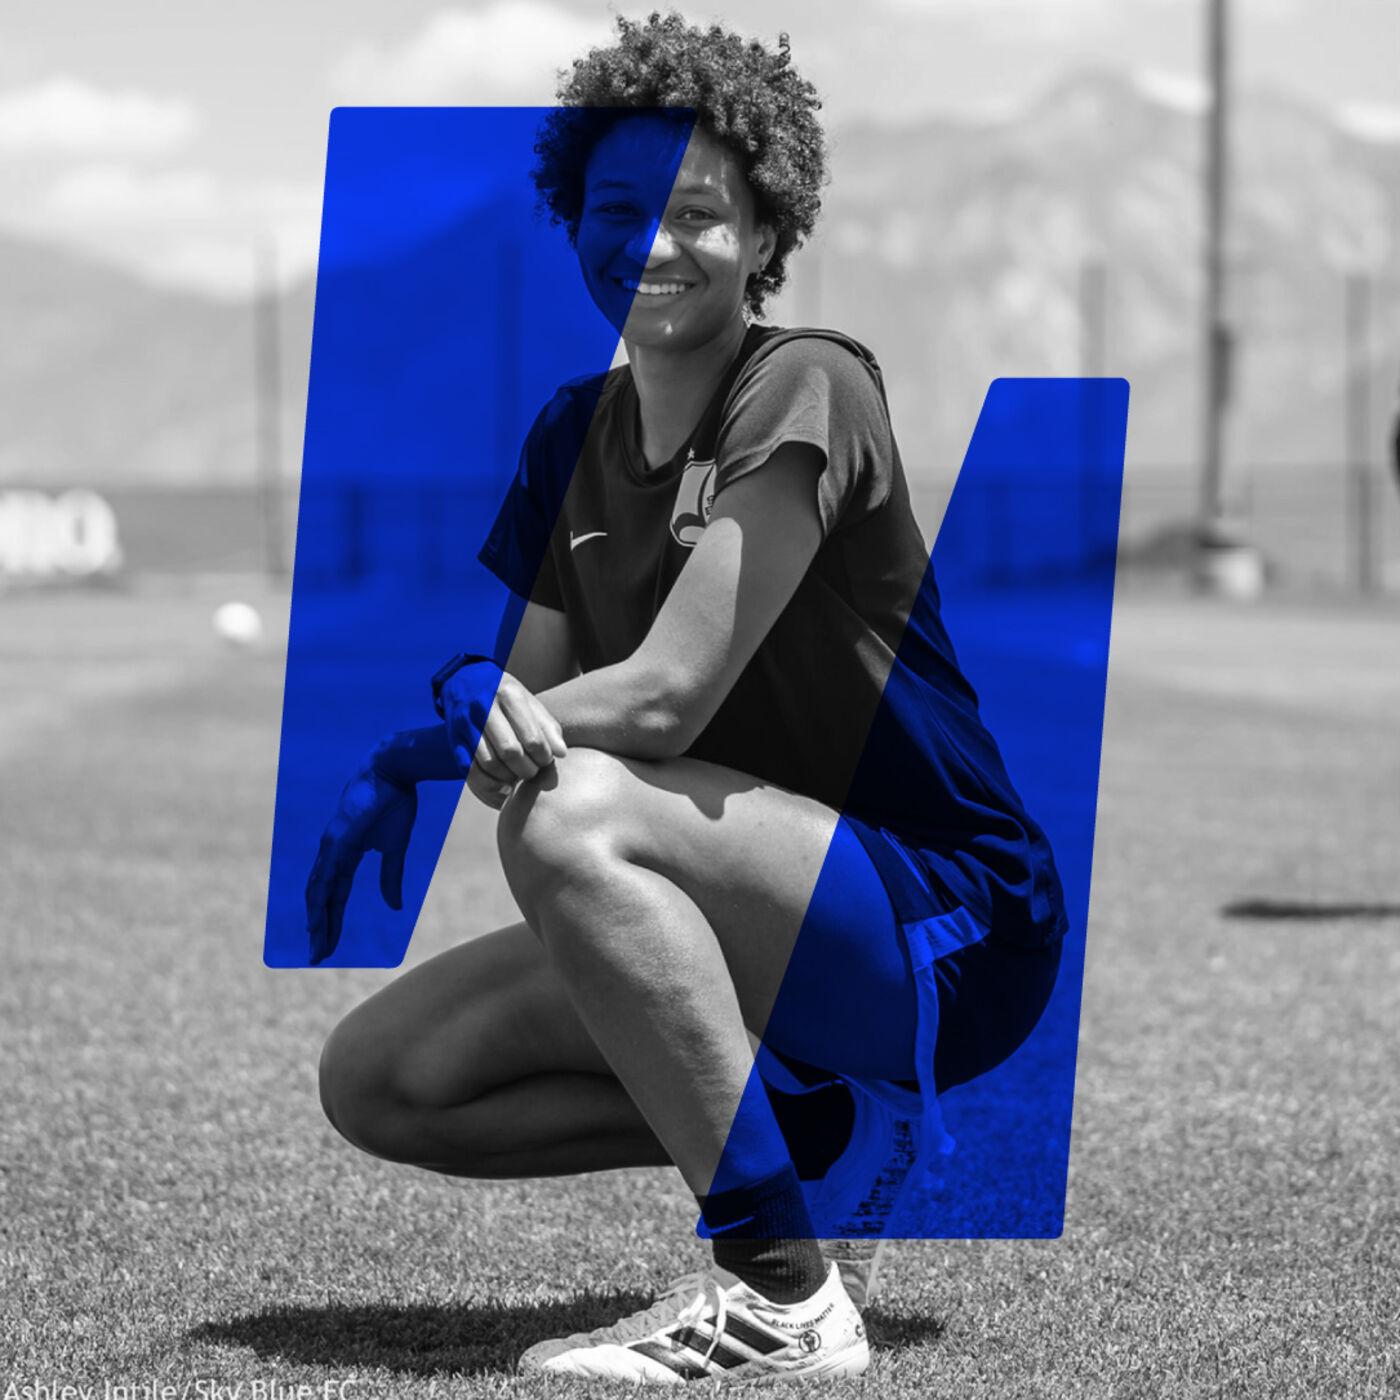 Episode 15. Imani Dorsey - Strength In Numbers